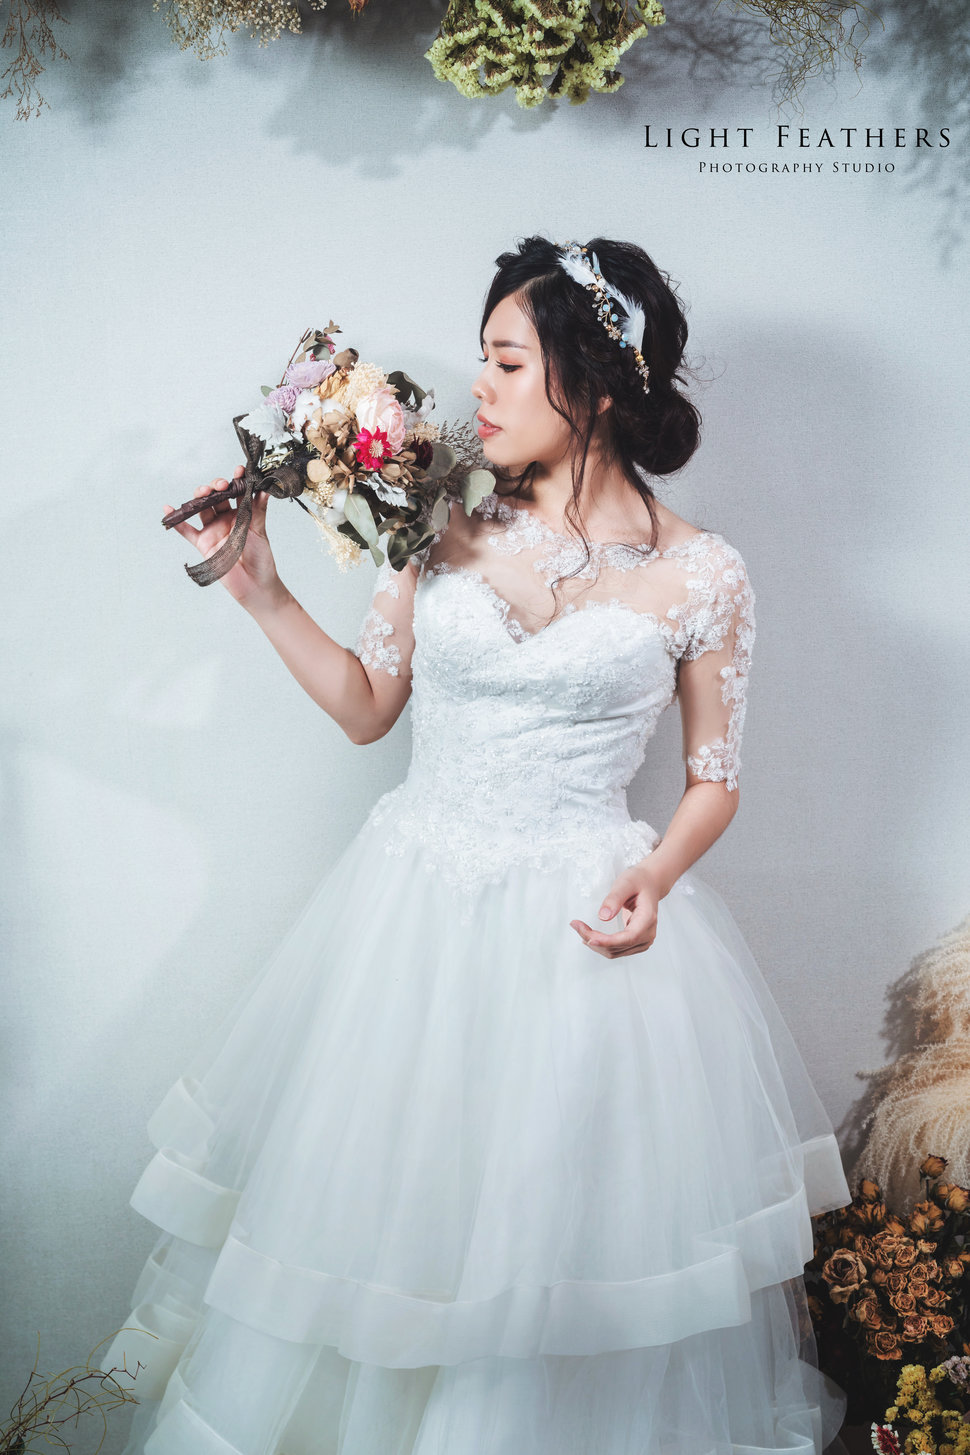 5D4_0135 - Promaker婚禮紀錄攝影團隊婚攝豪哥《結婚吧》